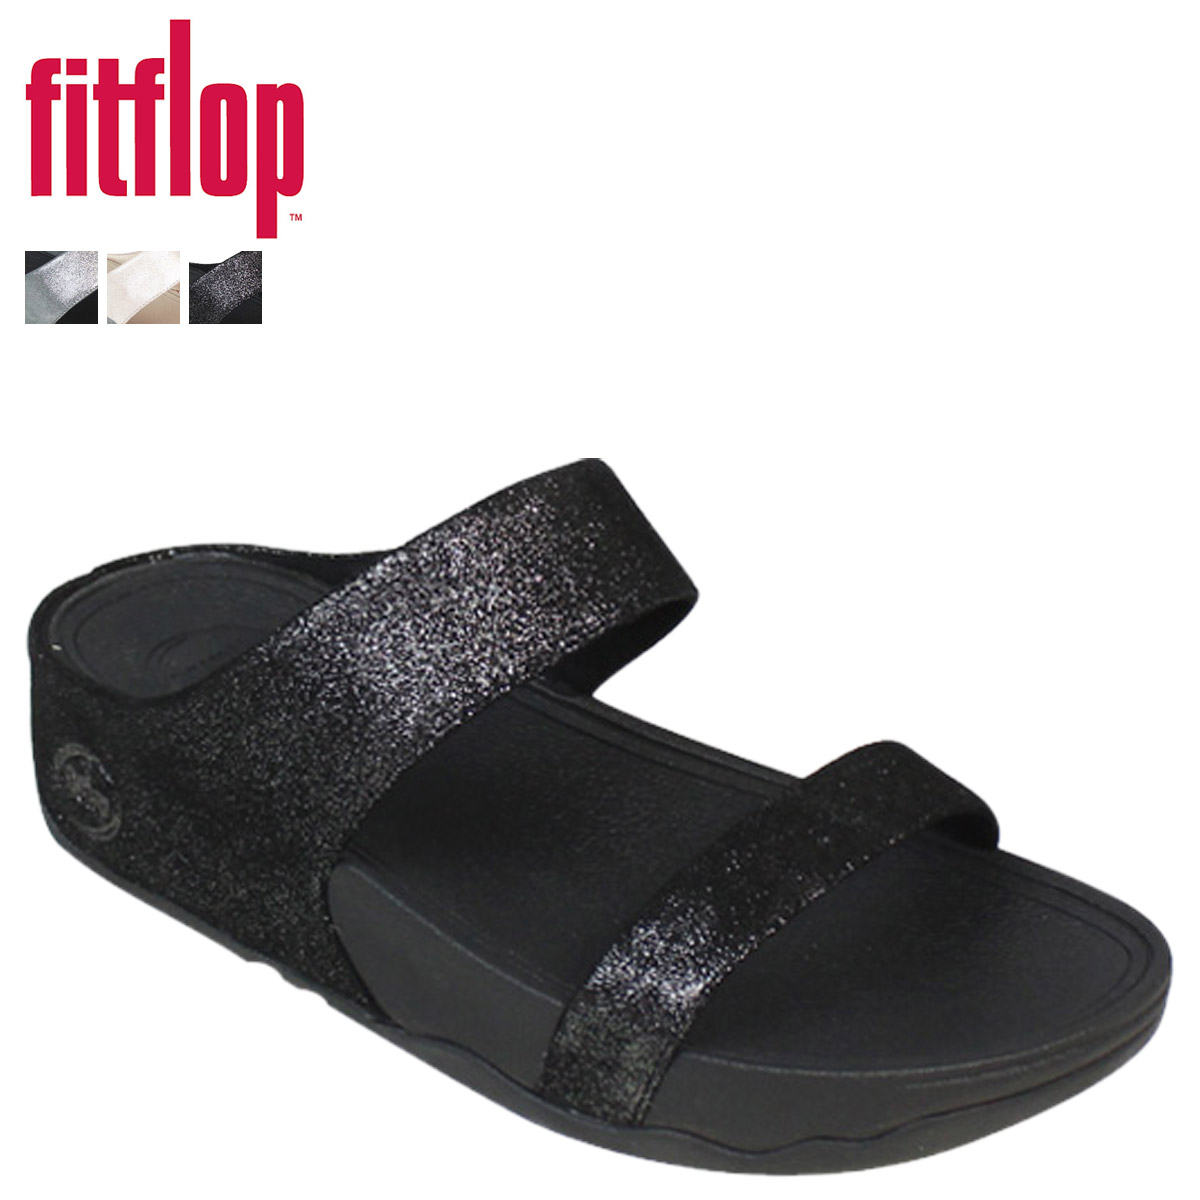 0064f089b67198 Fitflop Lulu Shimmer Suede Slide